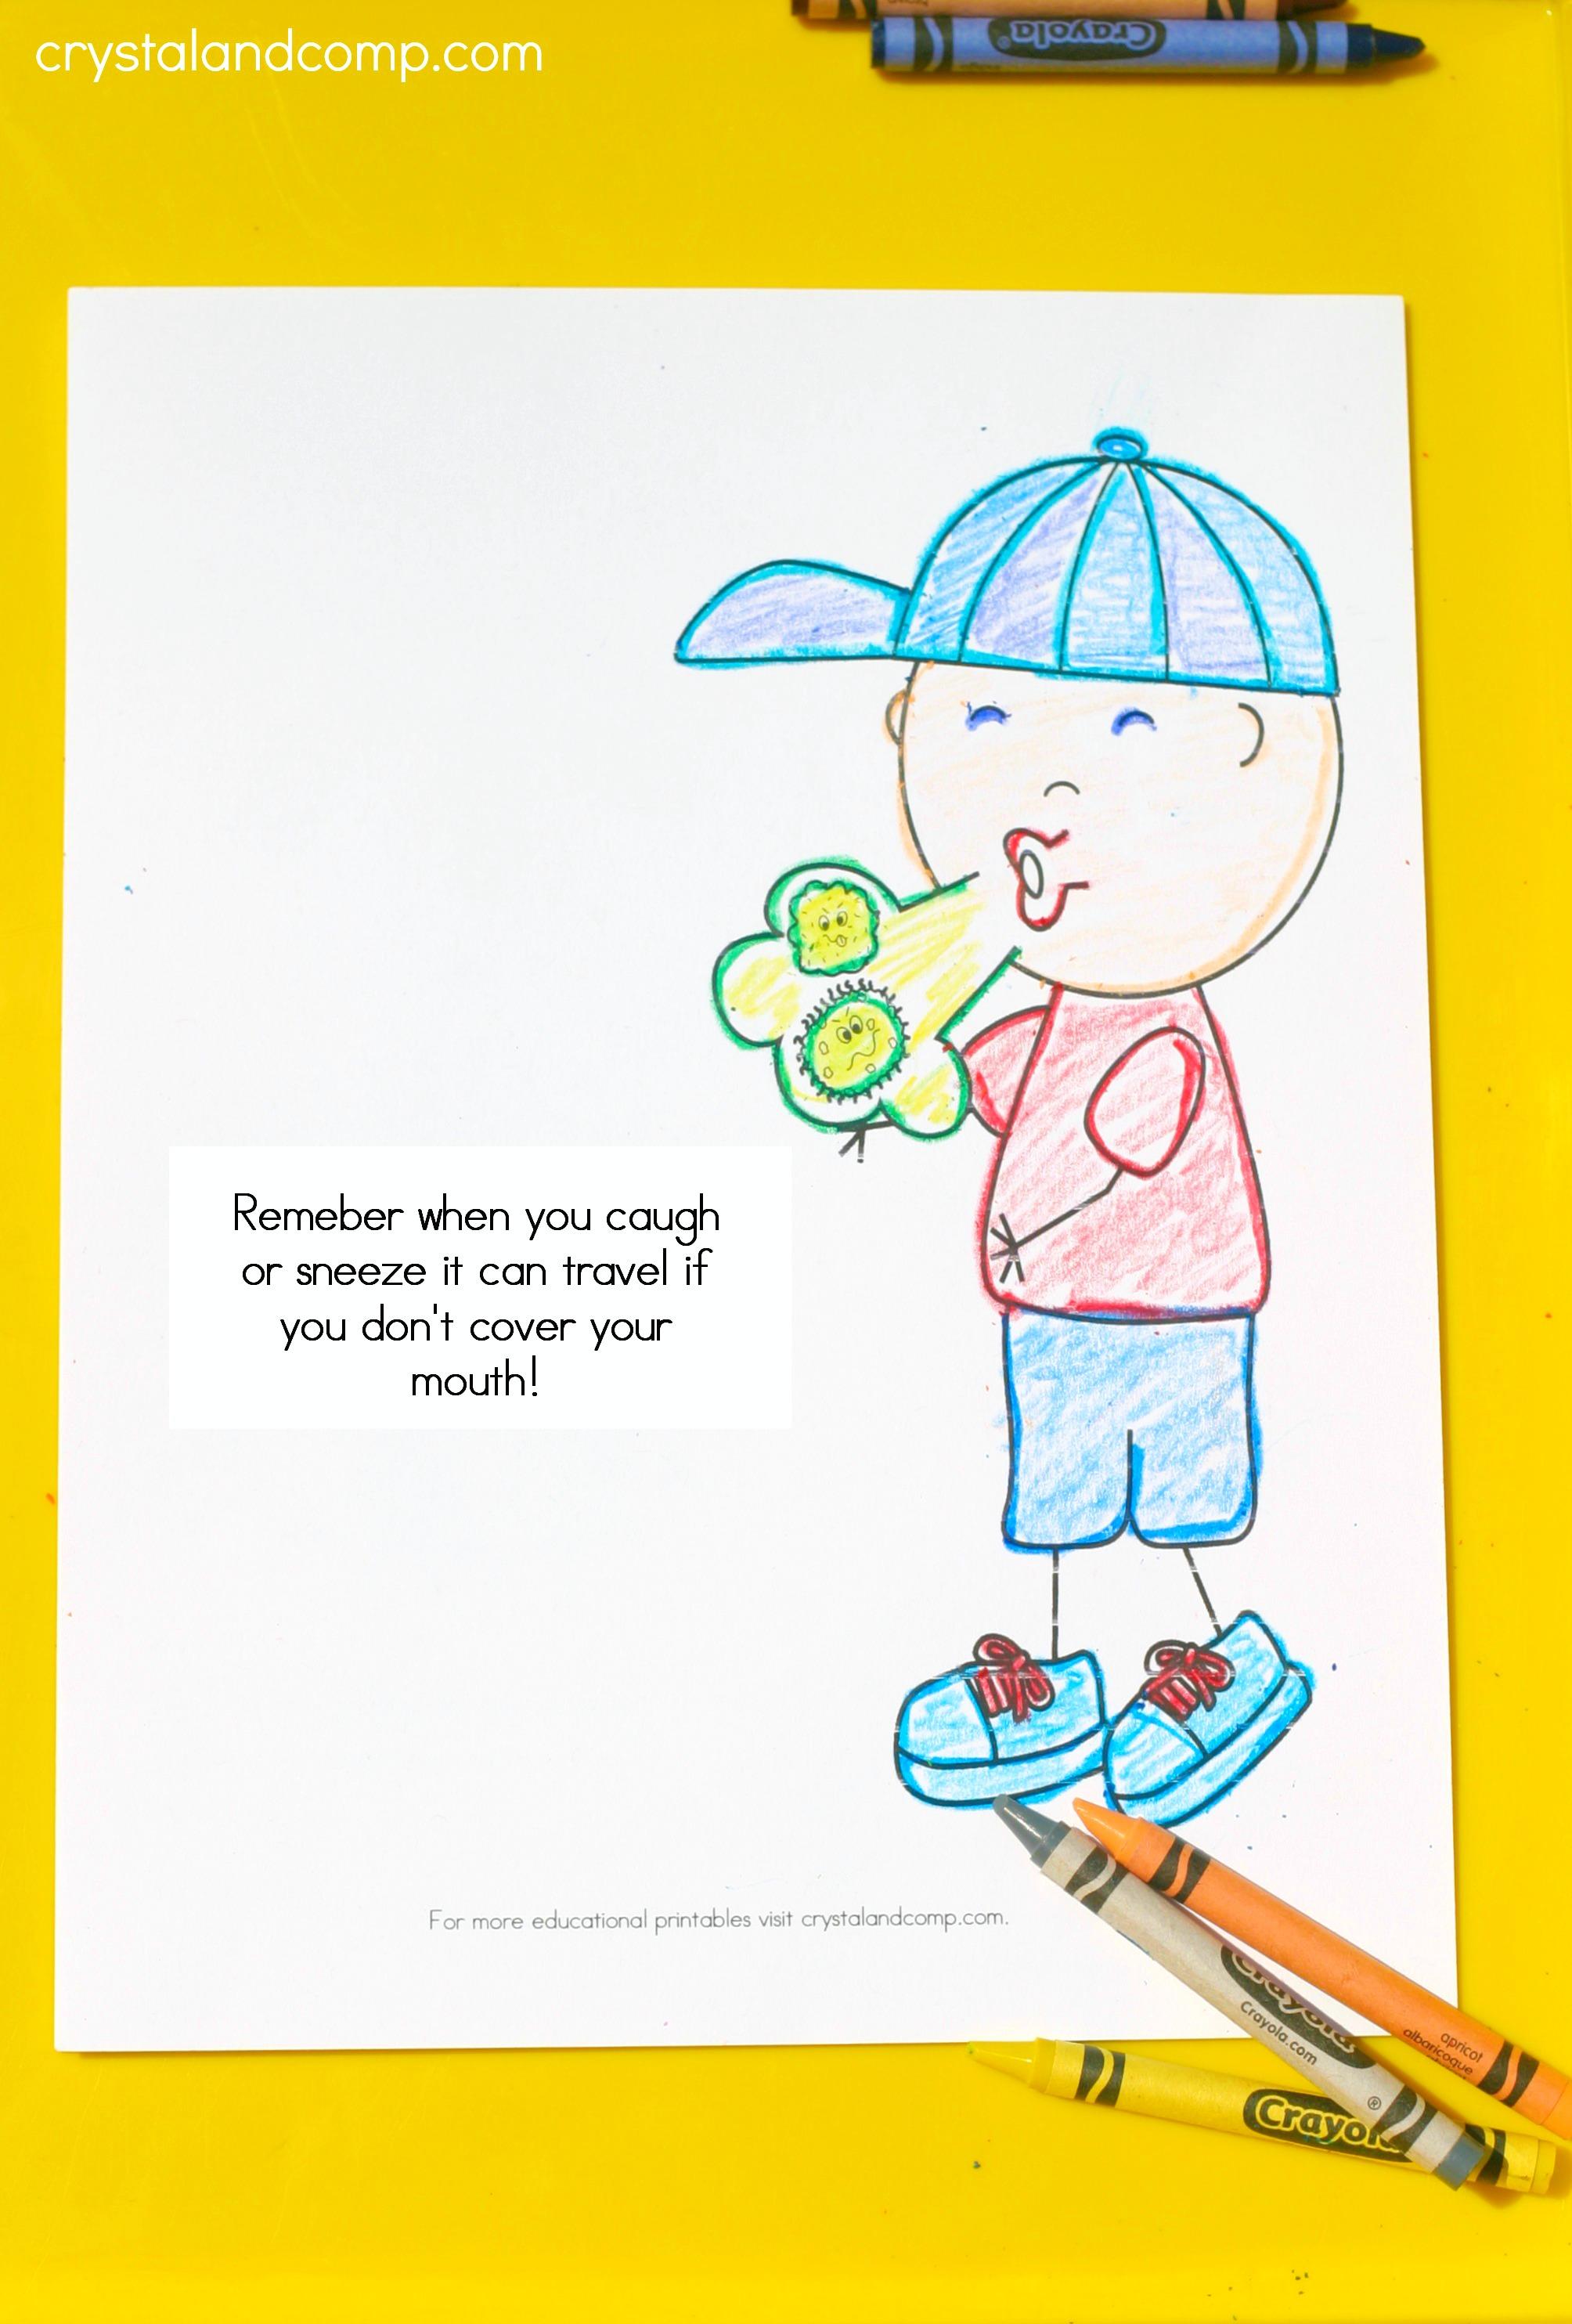 Free coloring pages germs - Free Coloring Pages Germs 21